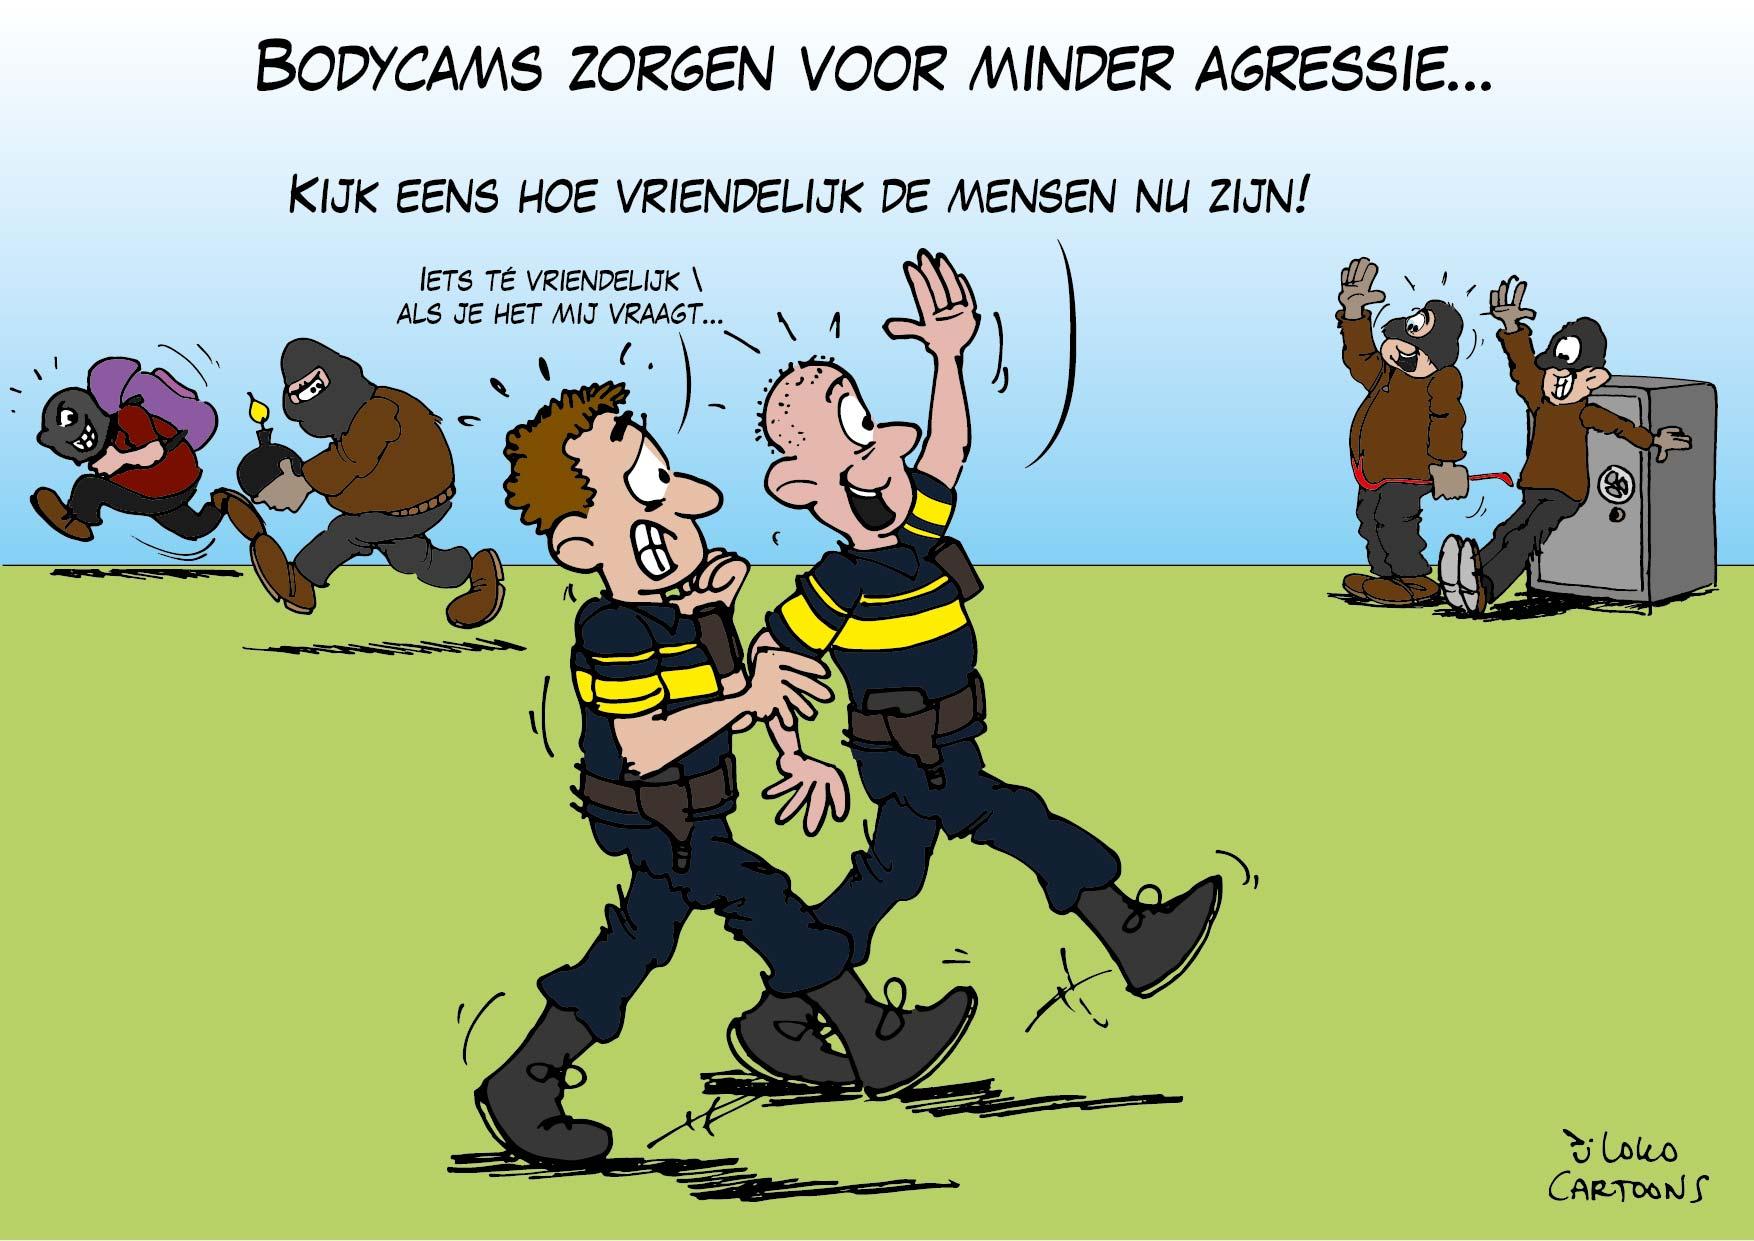 Bodycams zorgen voor minder agressie…